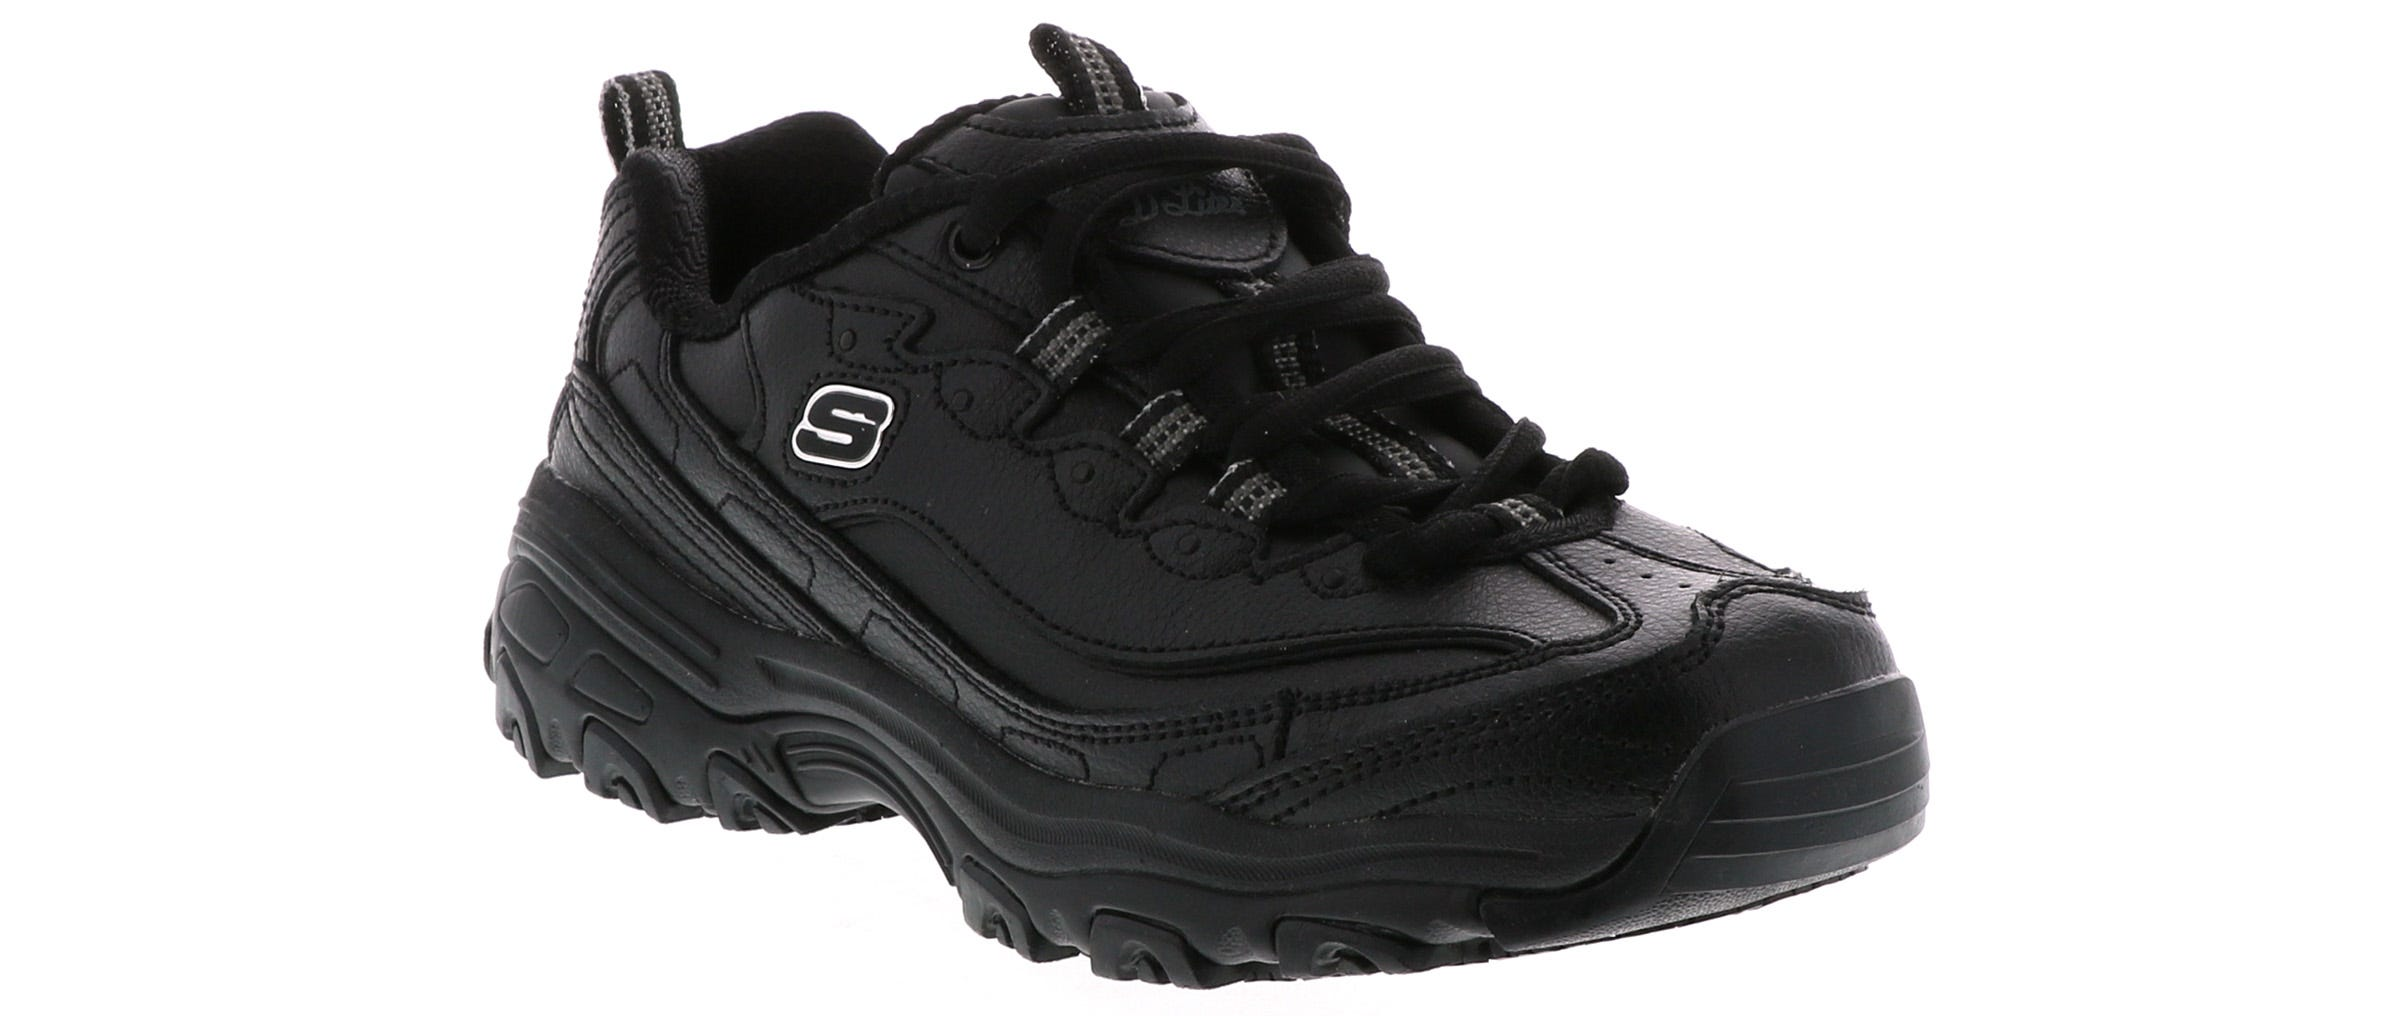 Women's Skechers D'lites Marbleton 76605 BLK Black Sko  Shoe